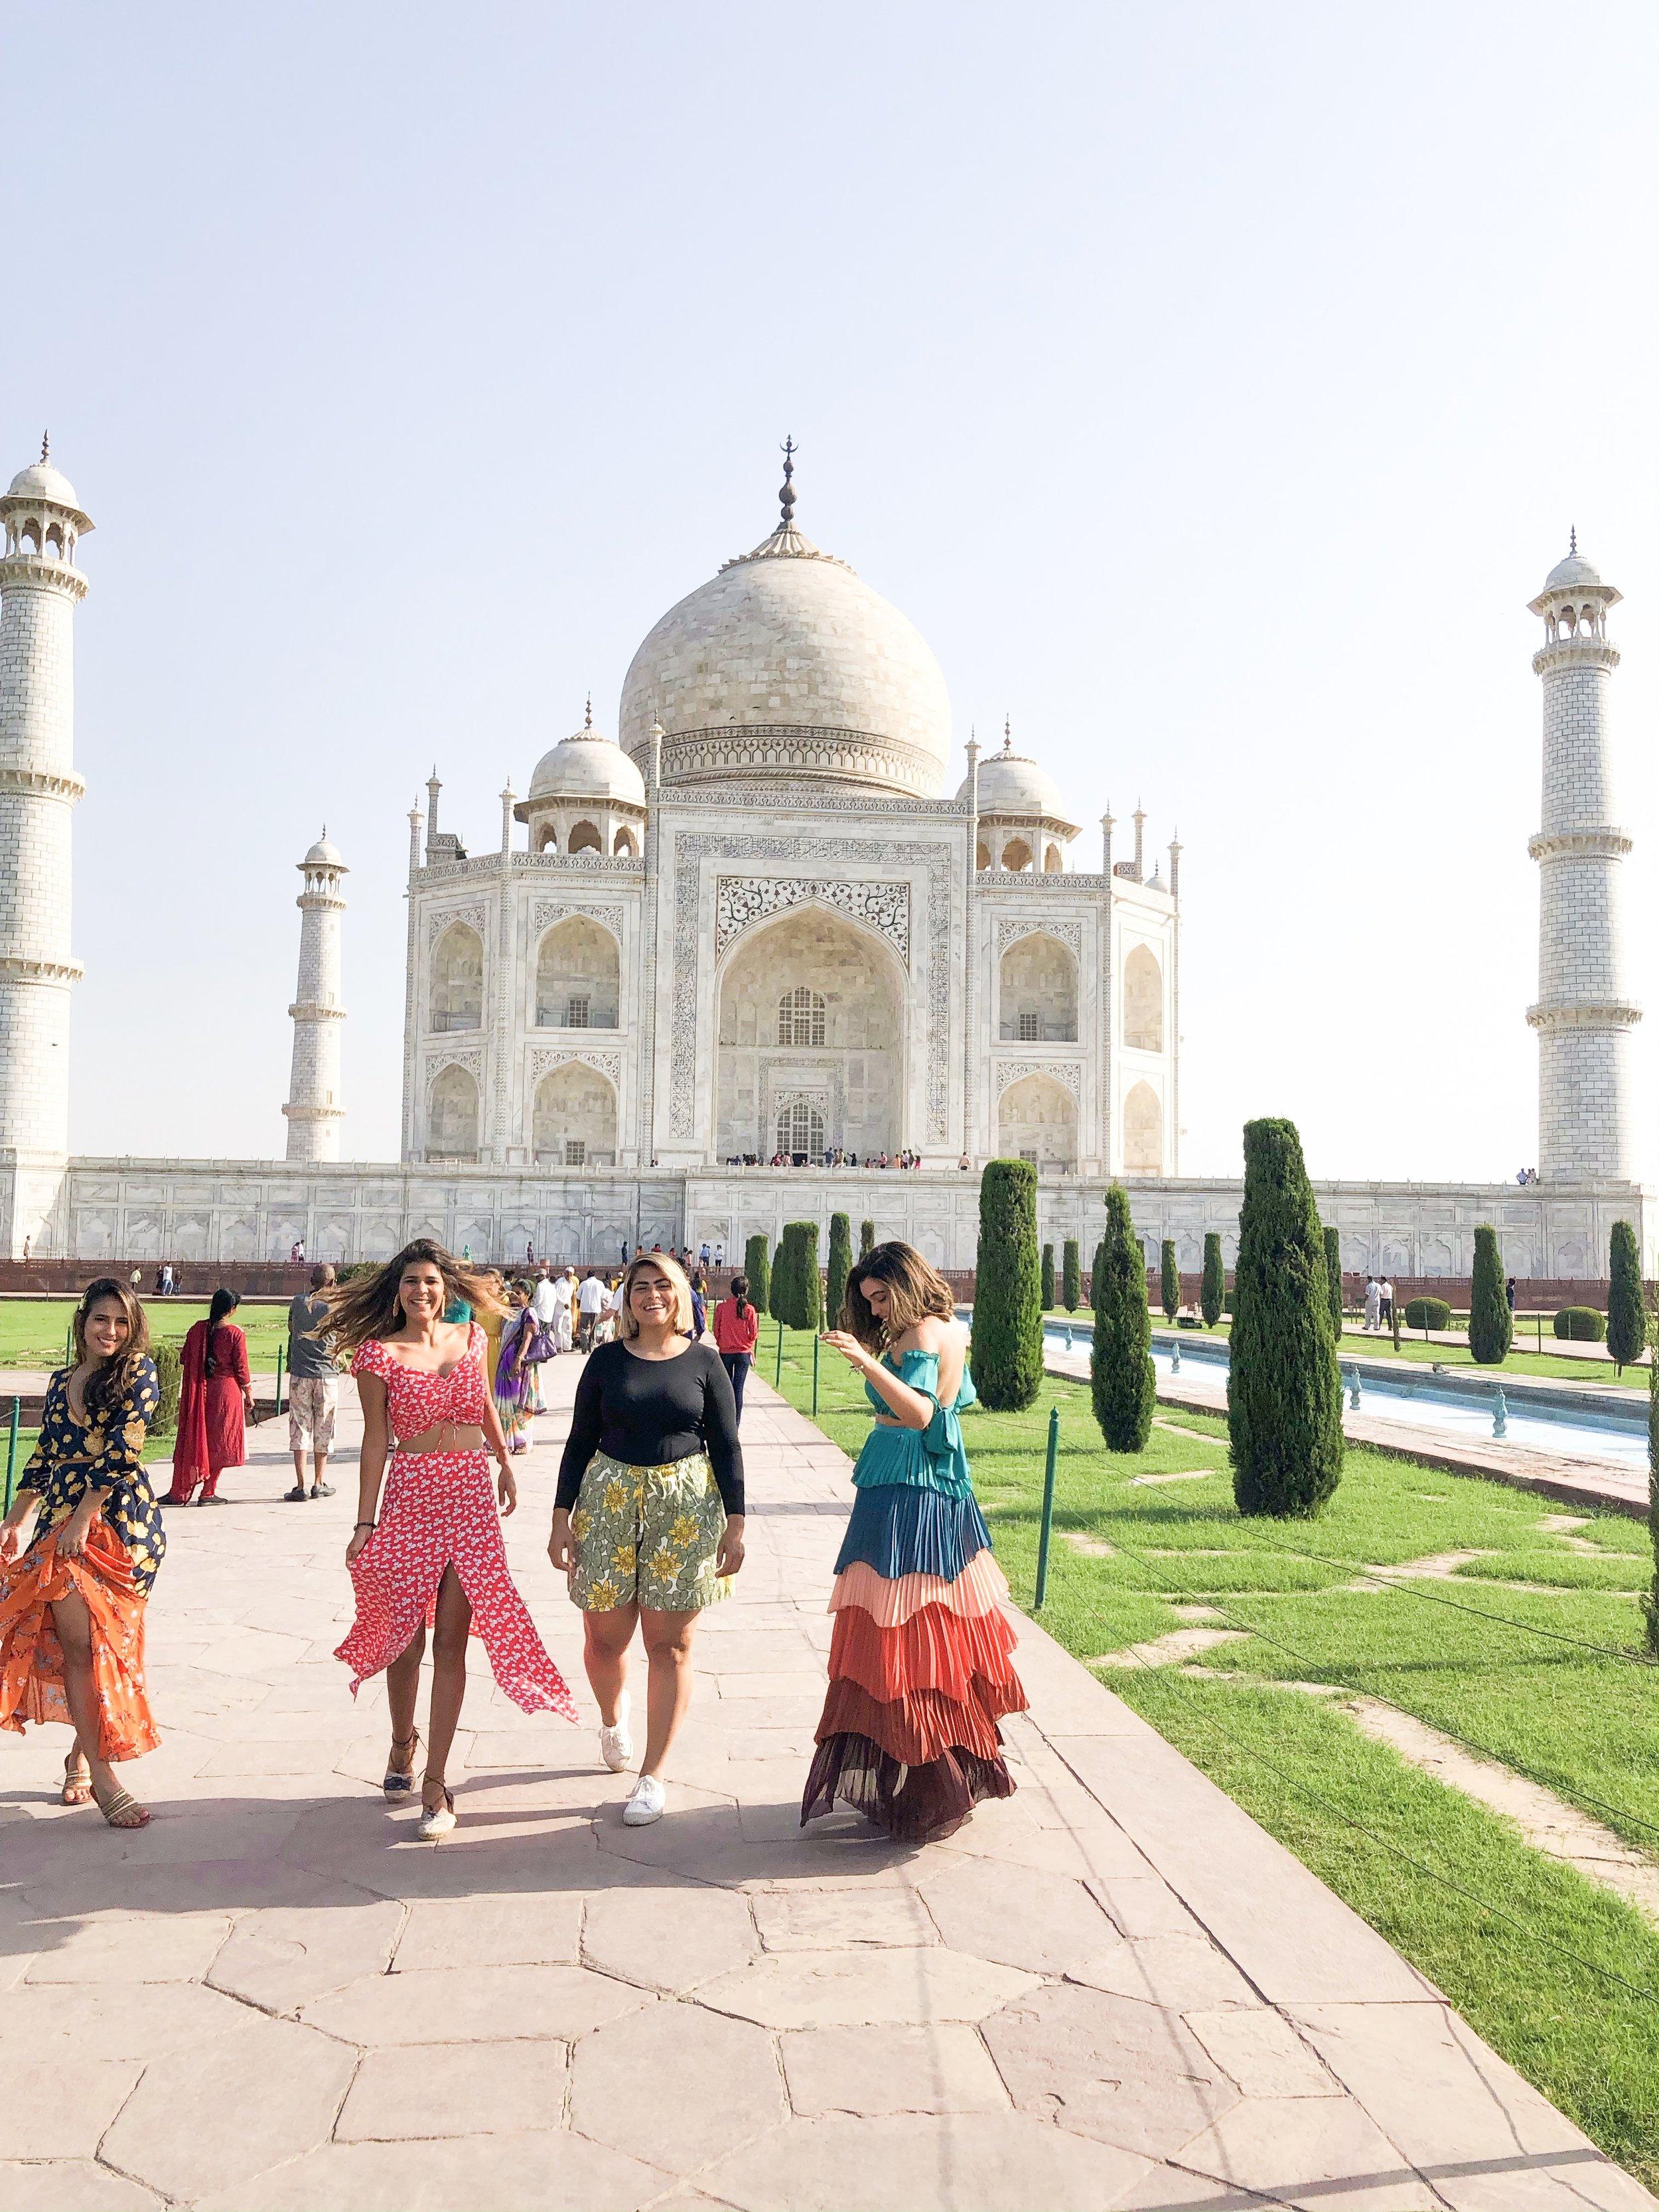 taj mahal maravilla del mundo fashion travel bloggers india